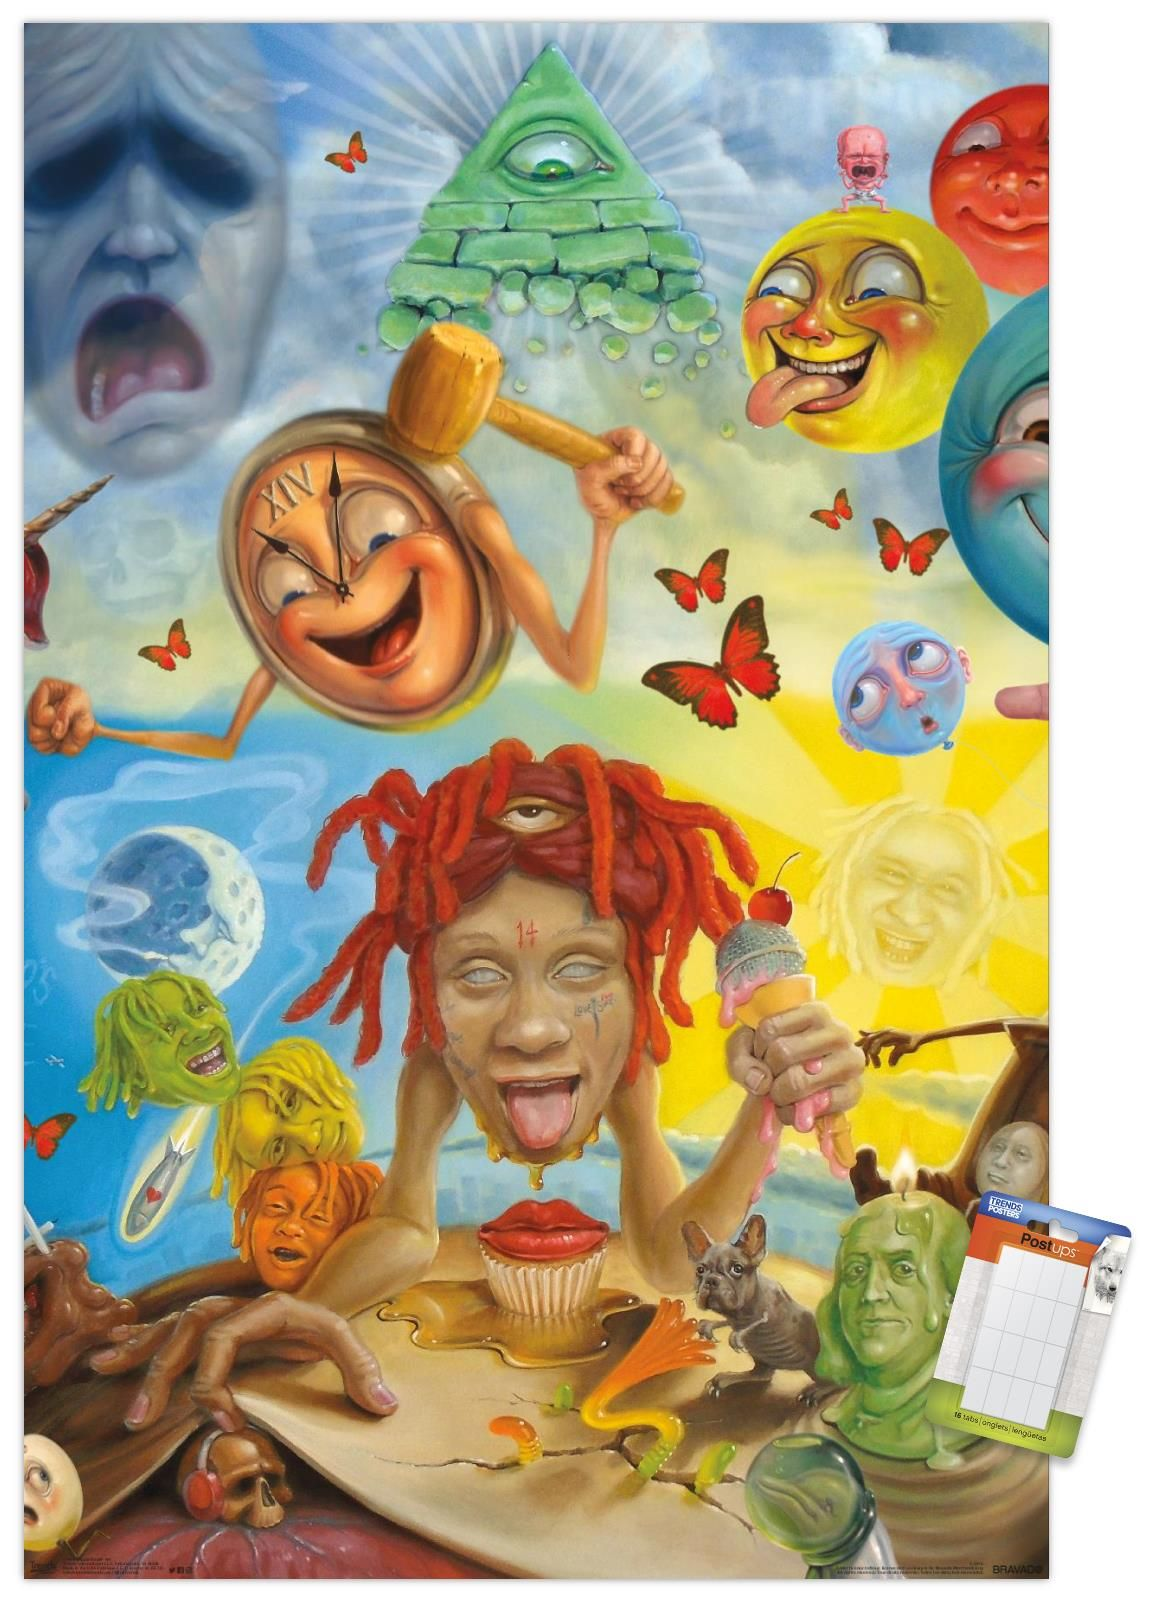 Trippie Redd Art Walmart Com In 2021 Cover Wallpaper Iphone Wallpaper Rap Album Cover Art